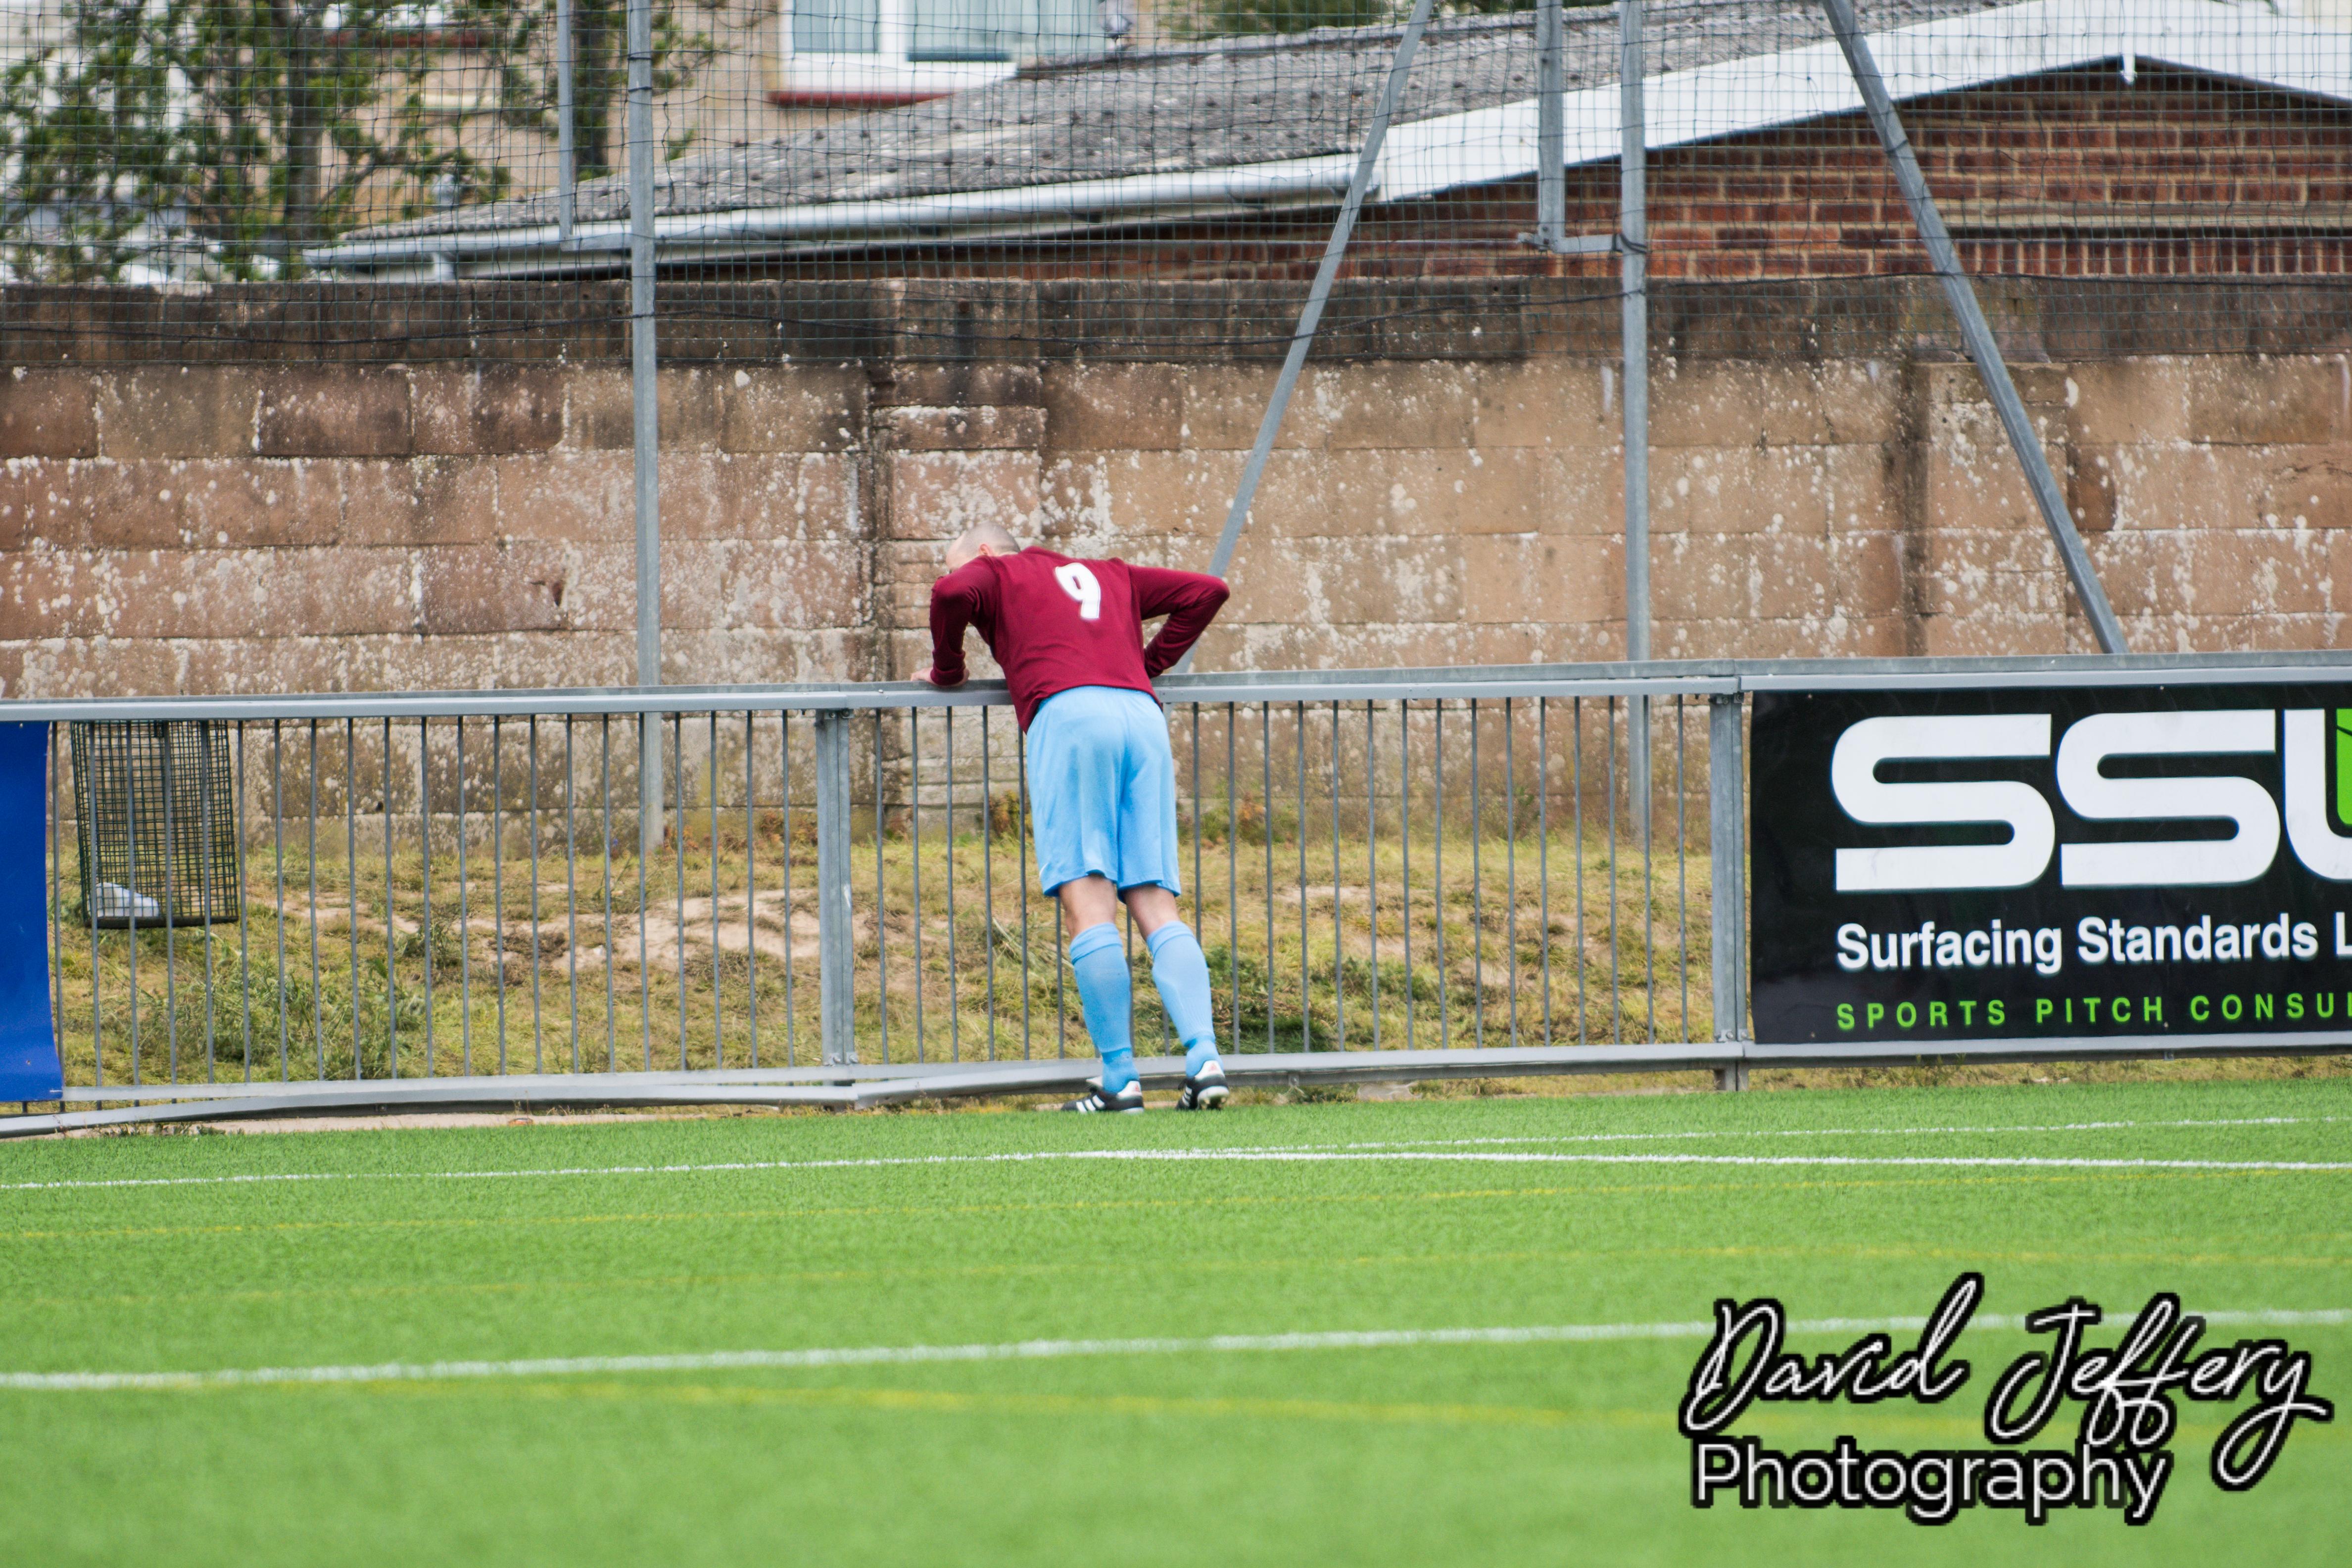 074 MOFC Vets vs Horl Vets 05.05